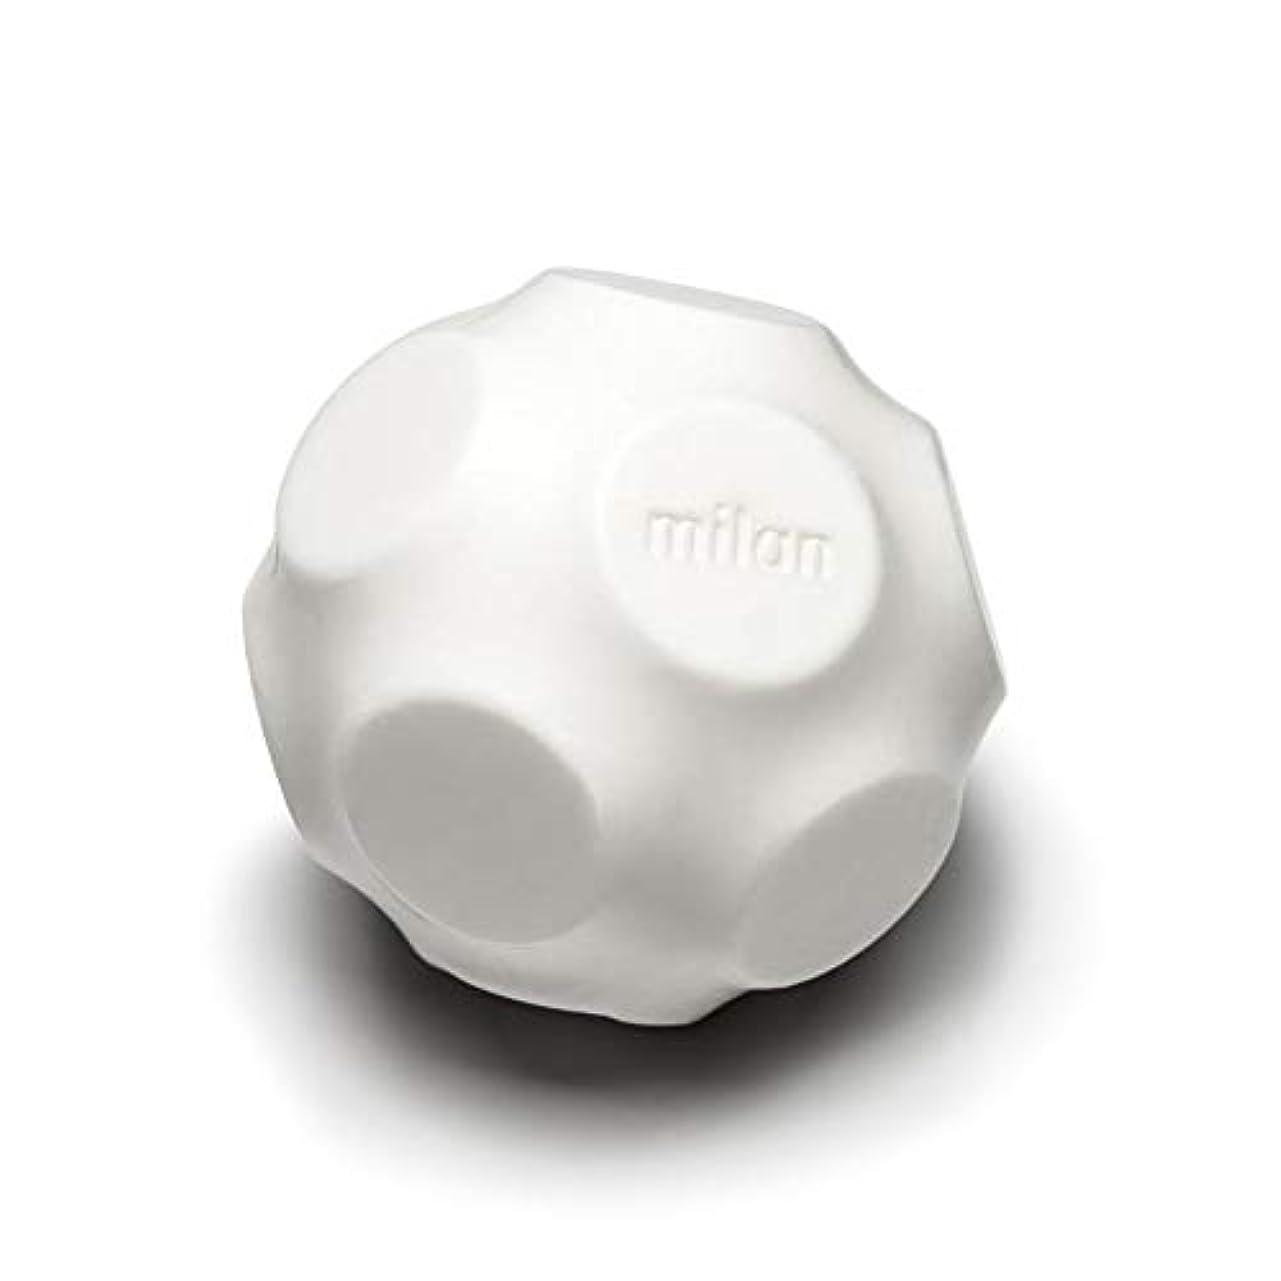 Maison Milan SIMONA ダイヤモンド粉 ホワイト 石鹸